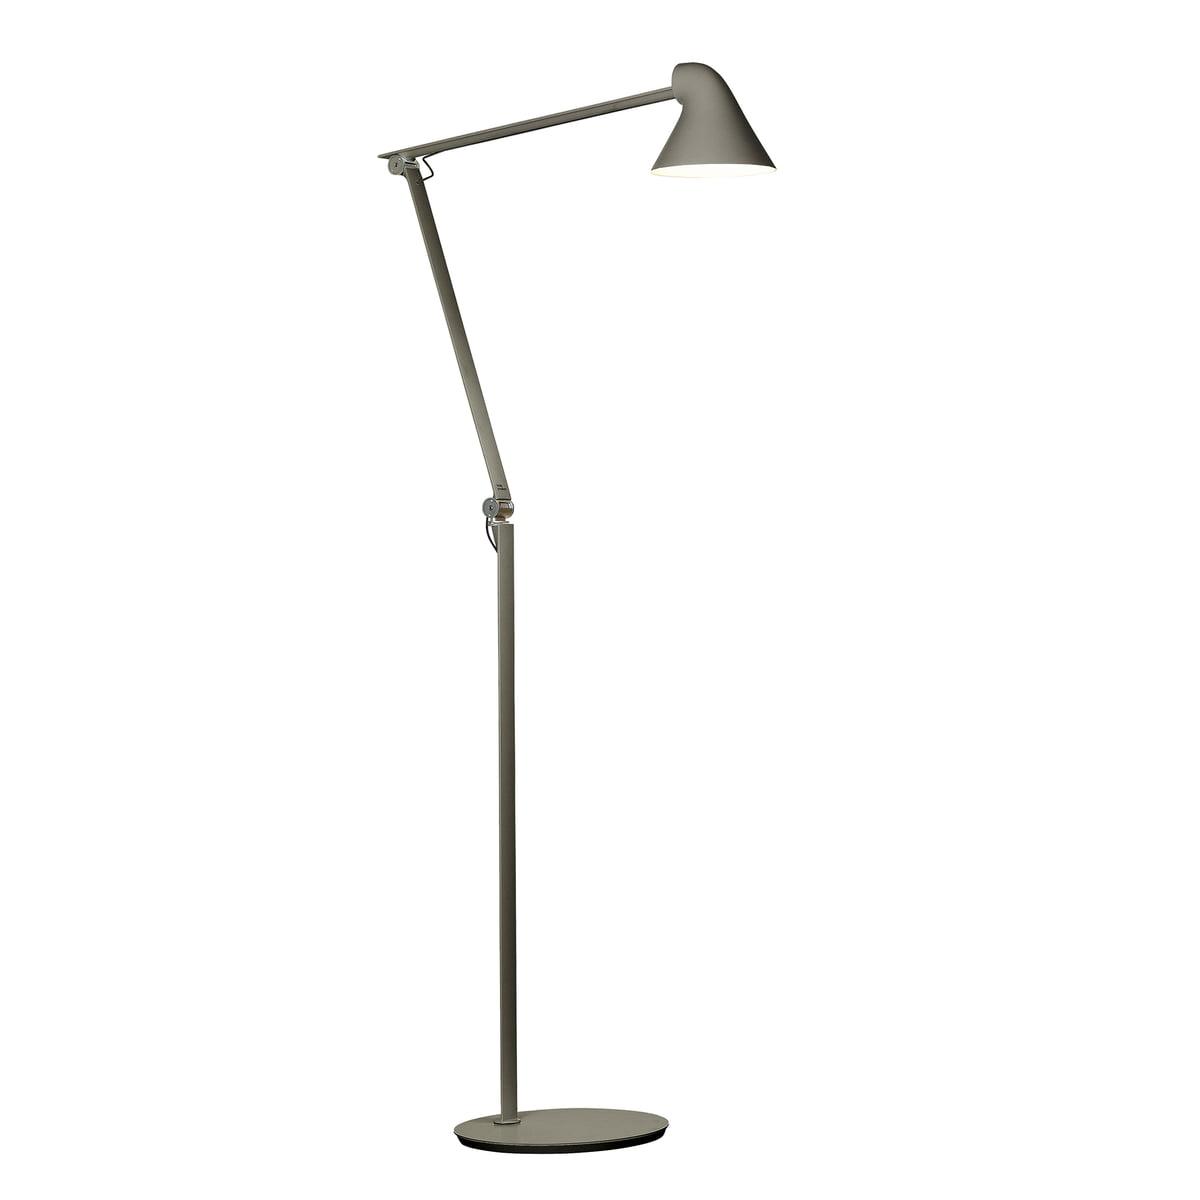 NJP LED floor lamp by Louis Poulsen